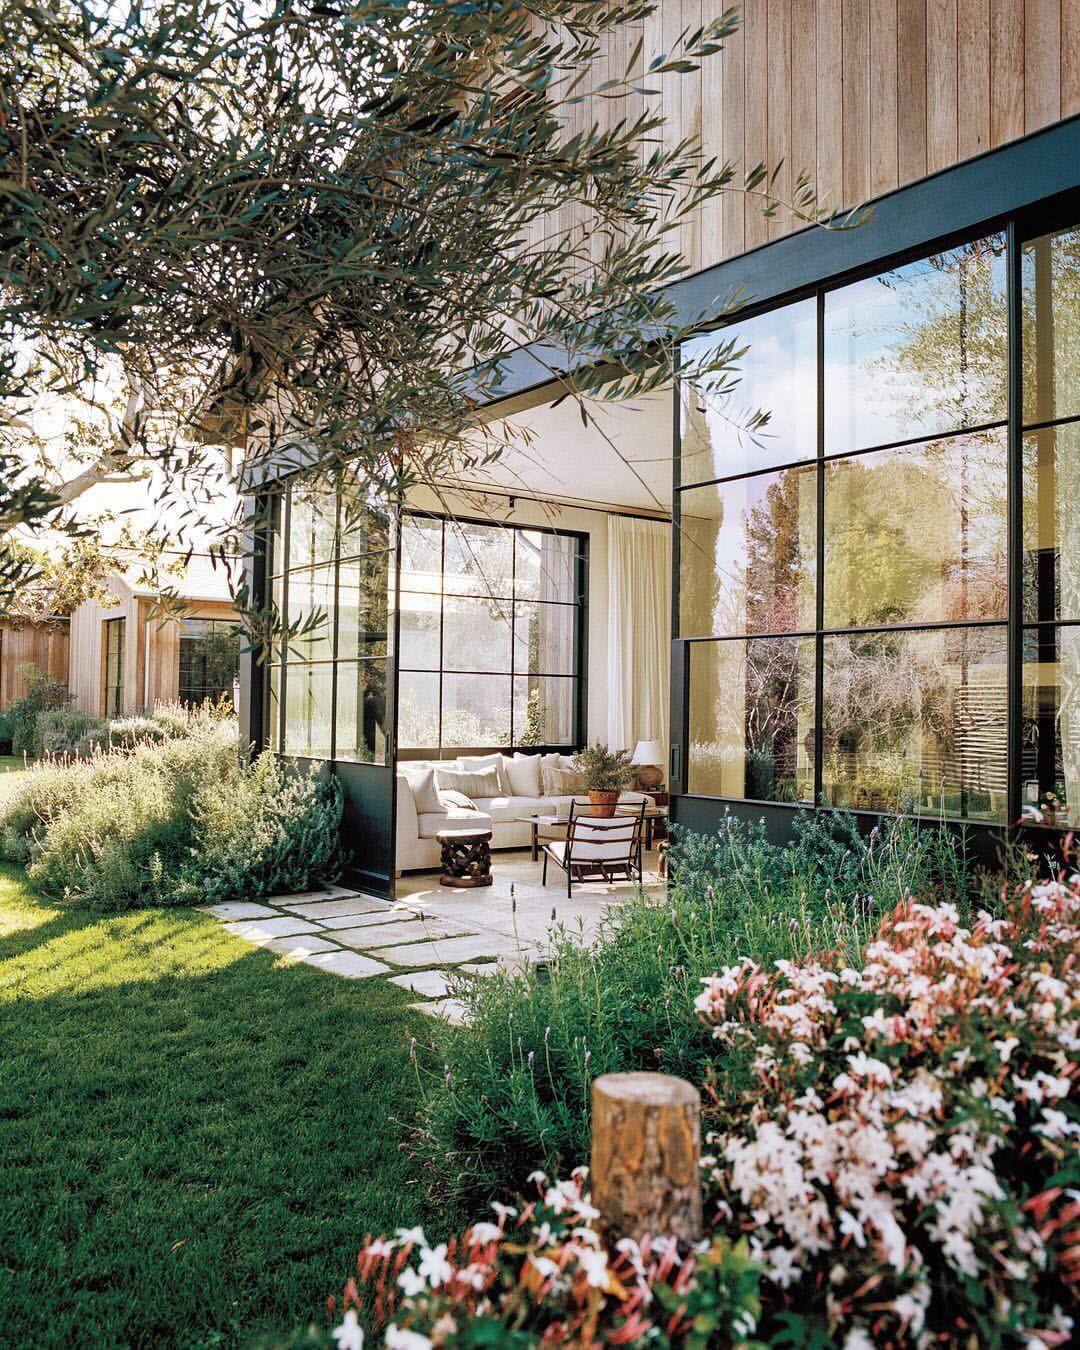 Véranda De Jardin Extérieur decoration: top 25 of the most beautiful verandas spotted on